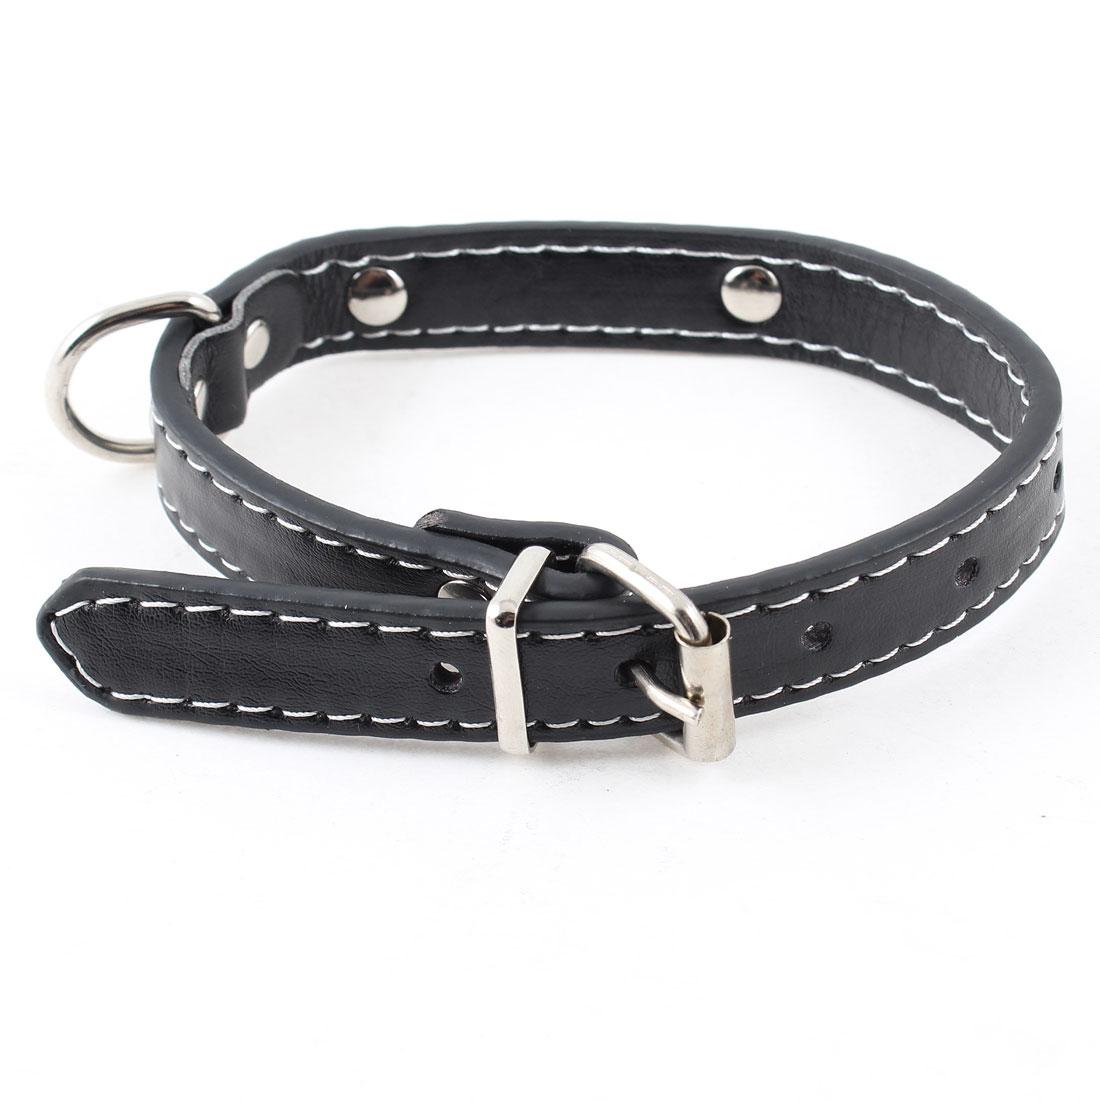 Single Prong Buckle Adjustable Band Pet Dog Puppy Collar Belt Black